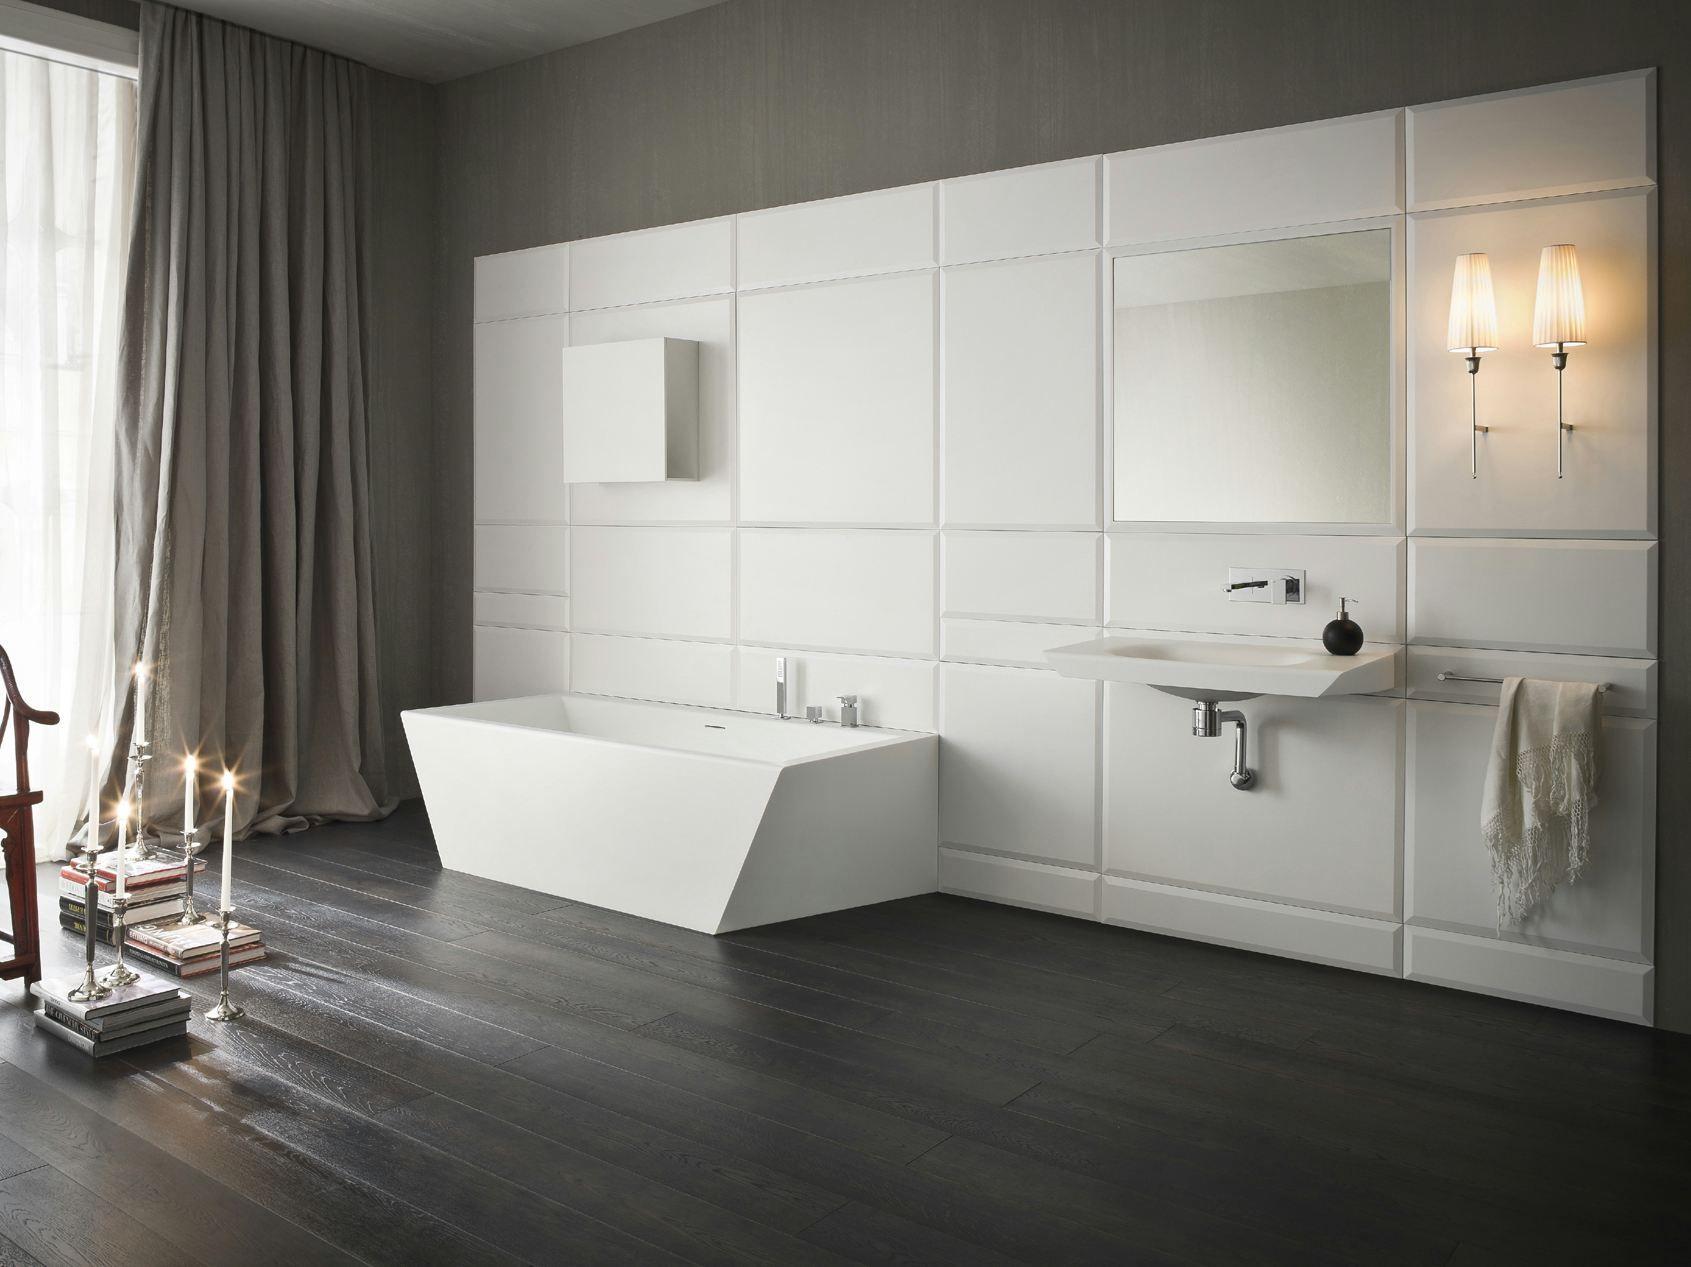 Warp by rexa design design carlo dal bianco for Badezimmer corian